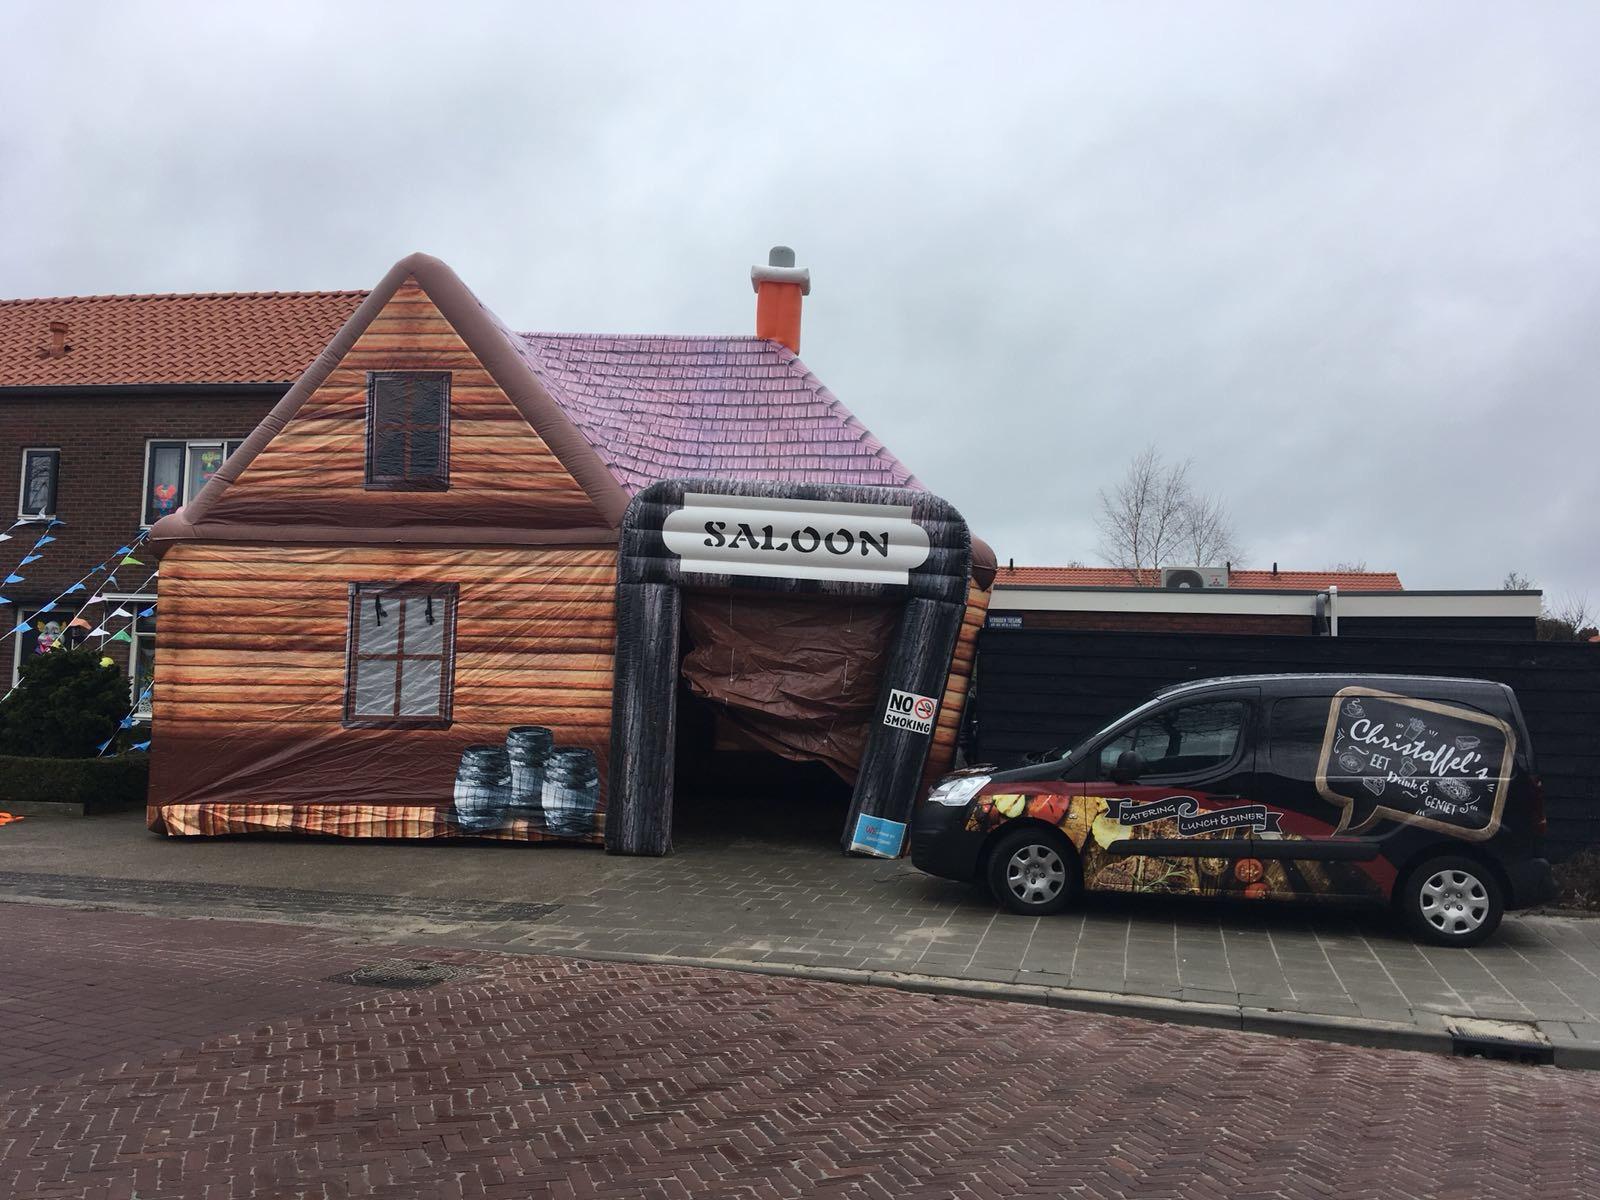 Saloon, opblaasbare party tent, feesttent in Oldenzaal